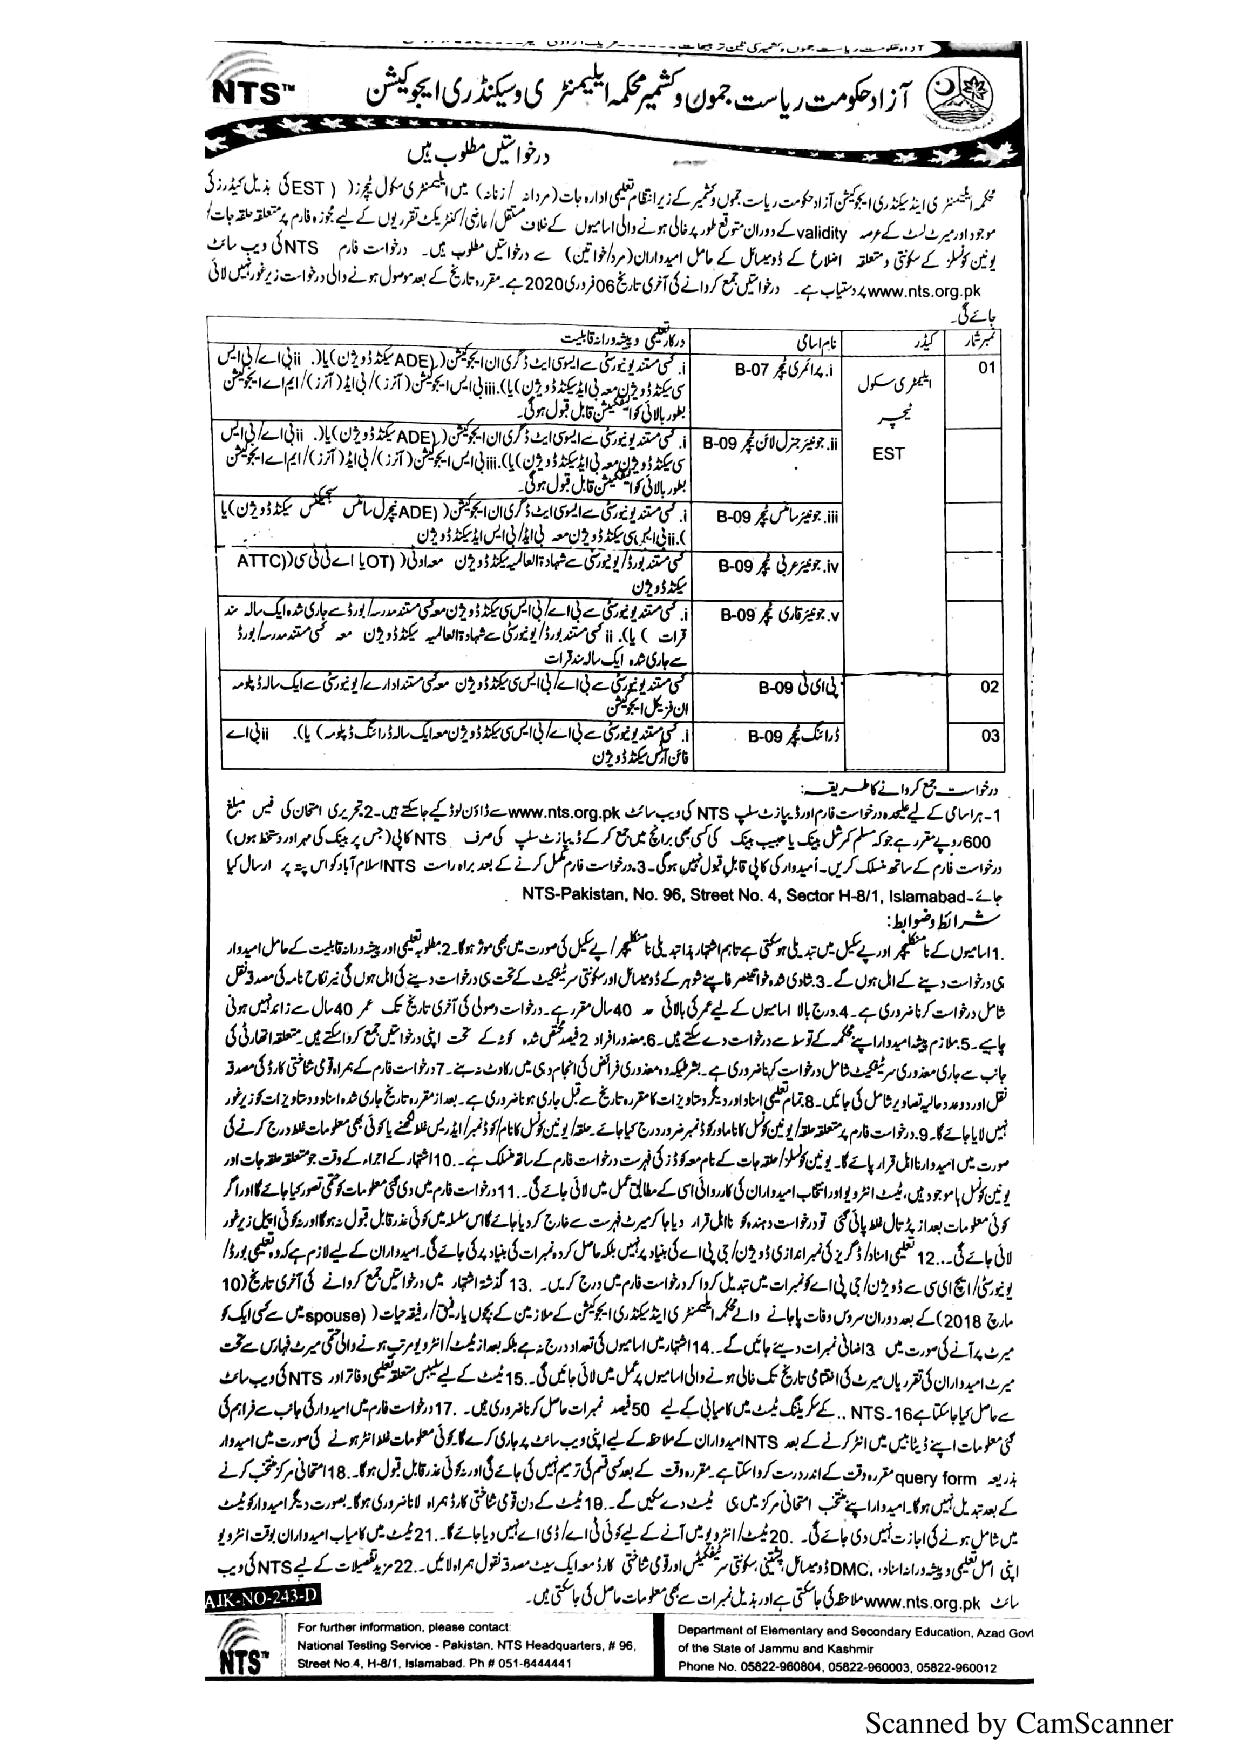 Elementary & Secondary Education Department AJK NTS Jobs 2020 Application Form Roll No Slip